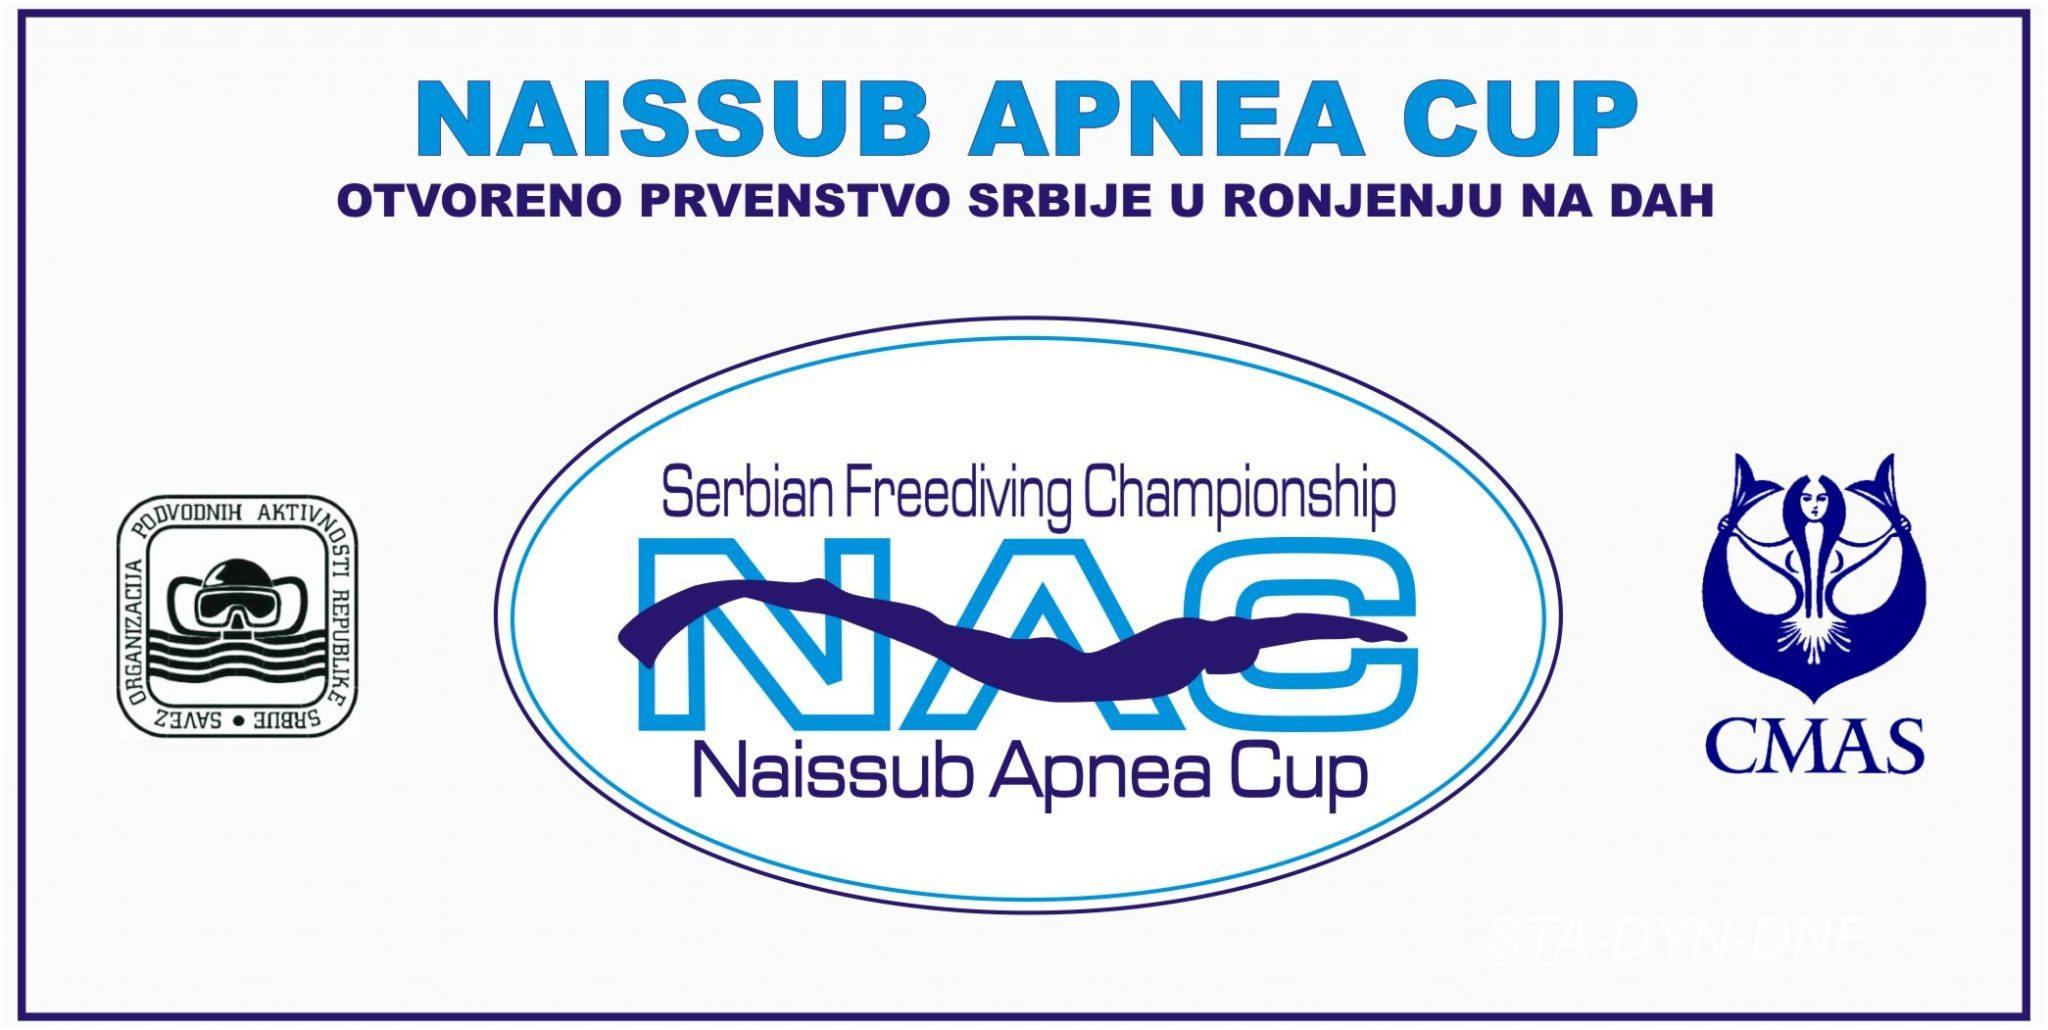 NIASSUB Apnea Cup